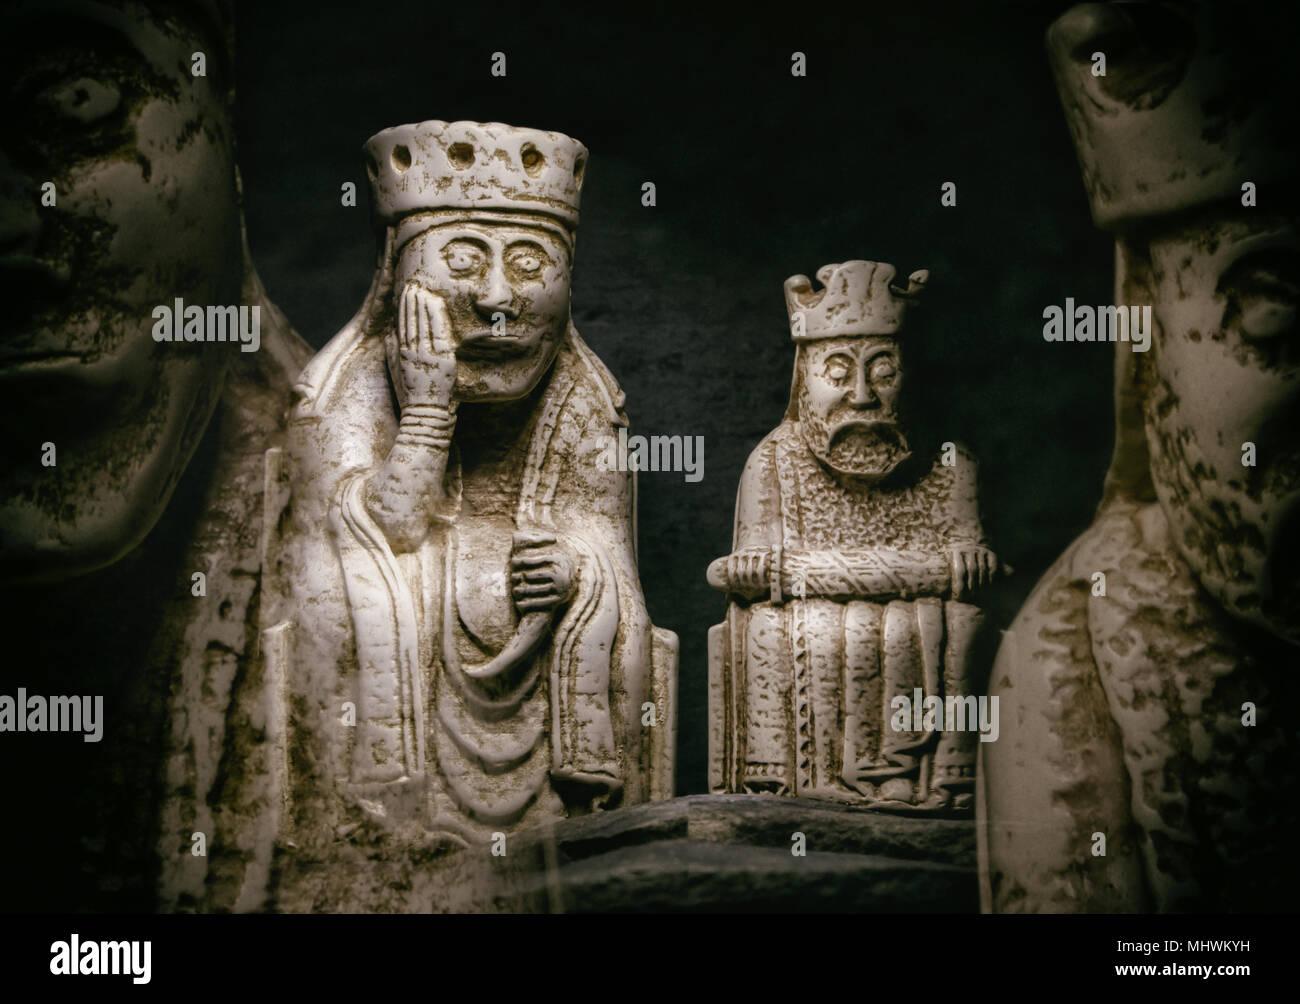 Lewis Chessmen - Stock Image